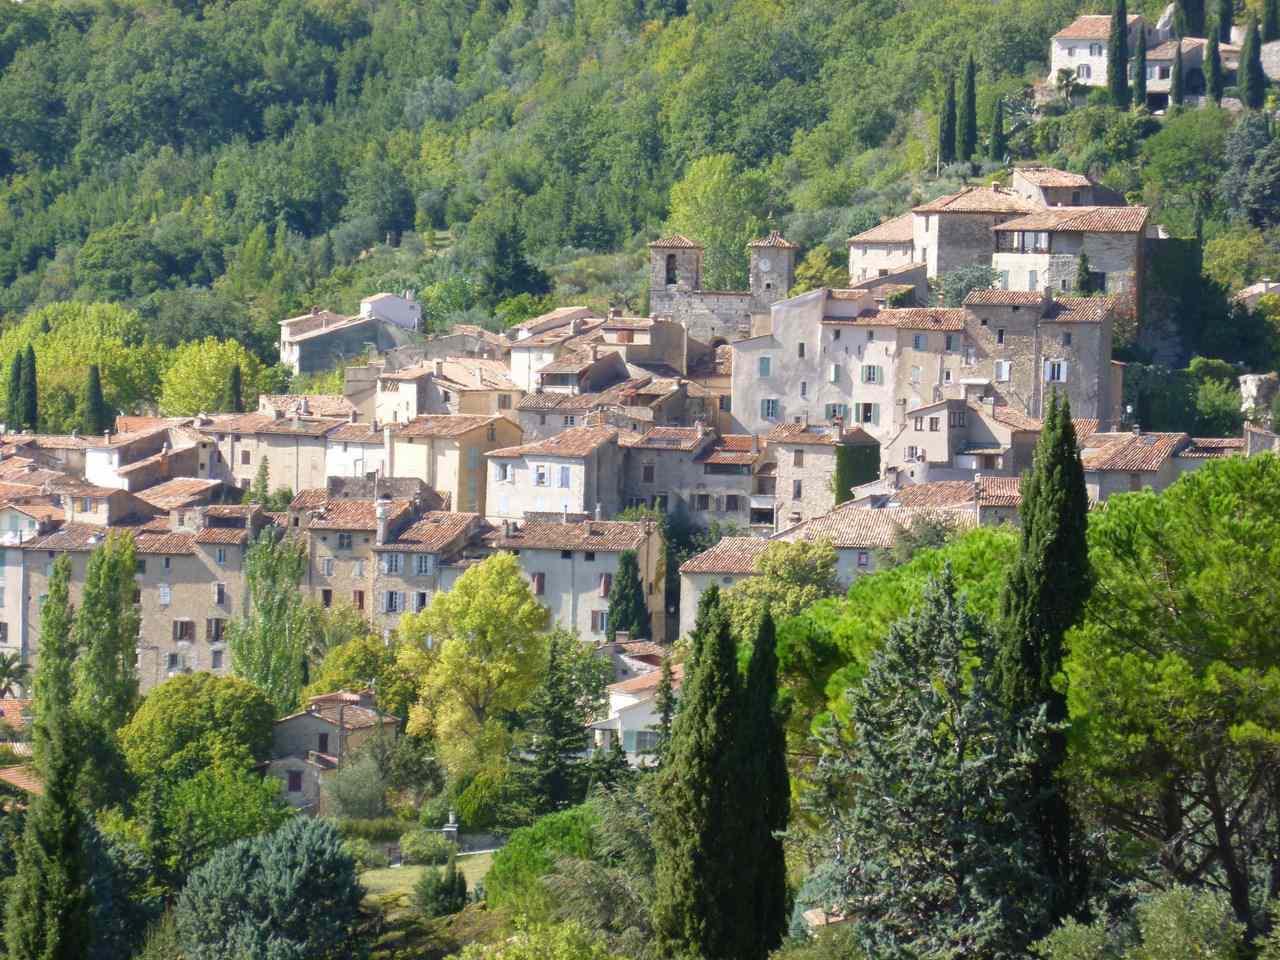 Seillans Hilltop Village in the Var, Provence